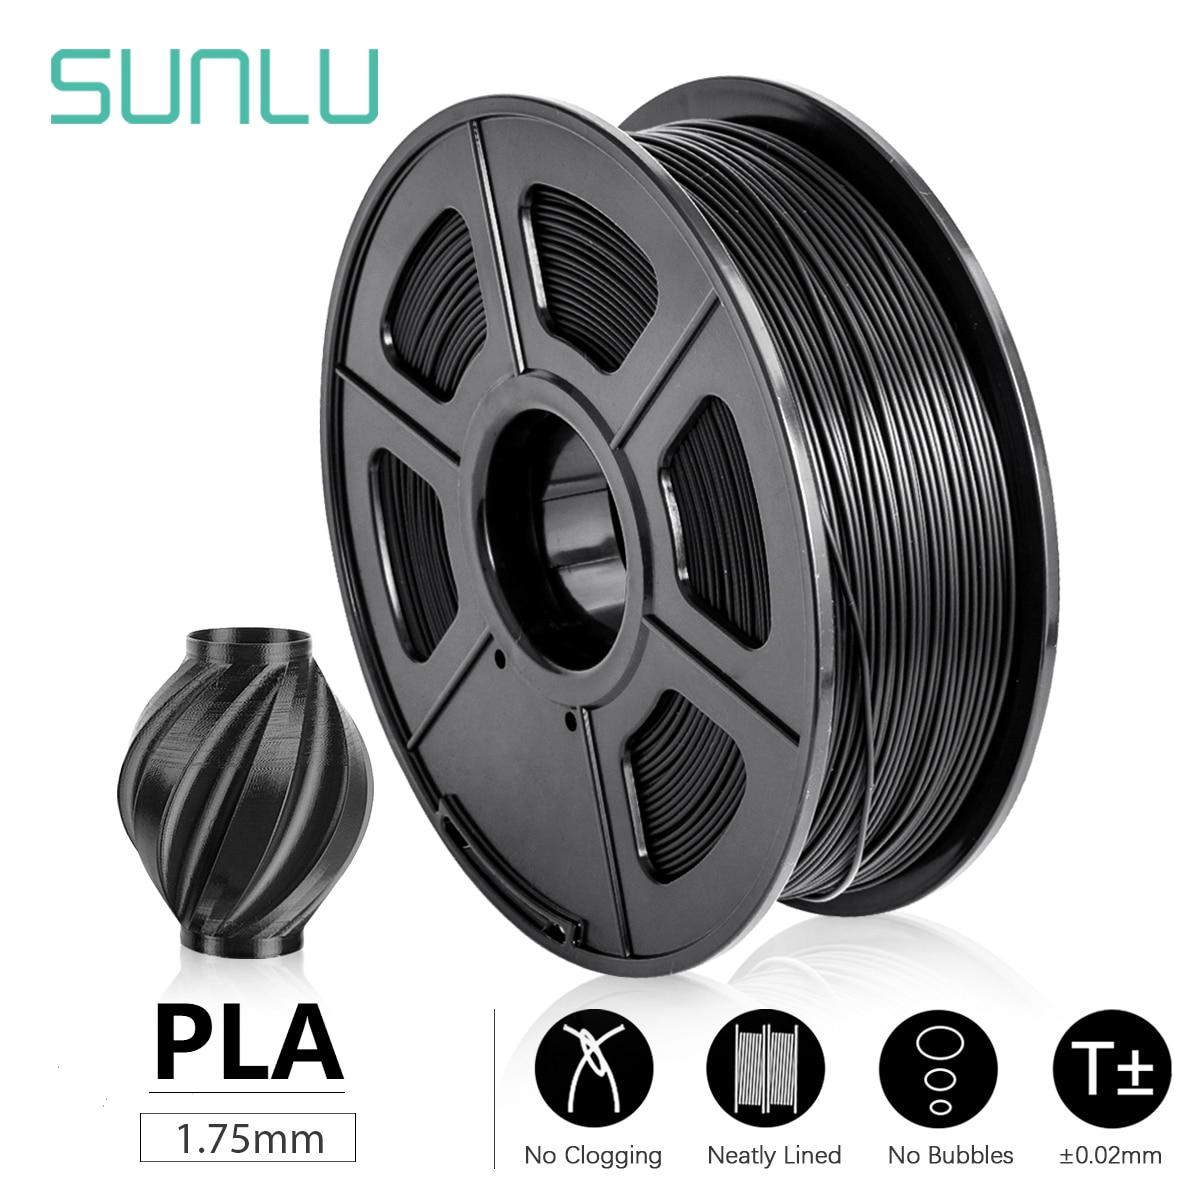 SUNLU 1.75mm PLA Filament 1KG 3D Printer Filament Plastic PLA 3D Printing Material Dimensional Accur